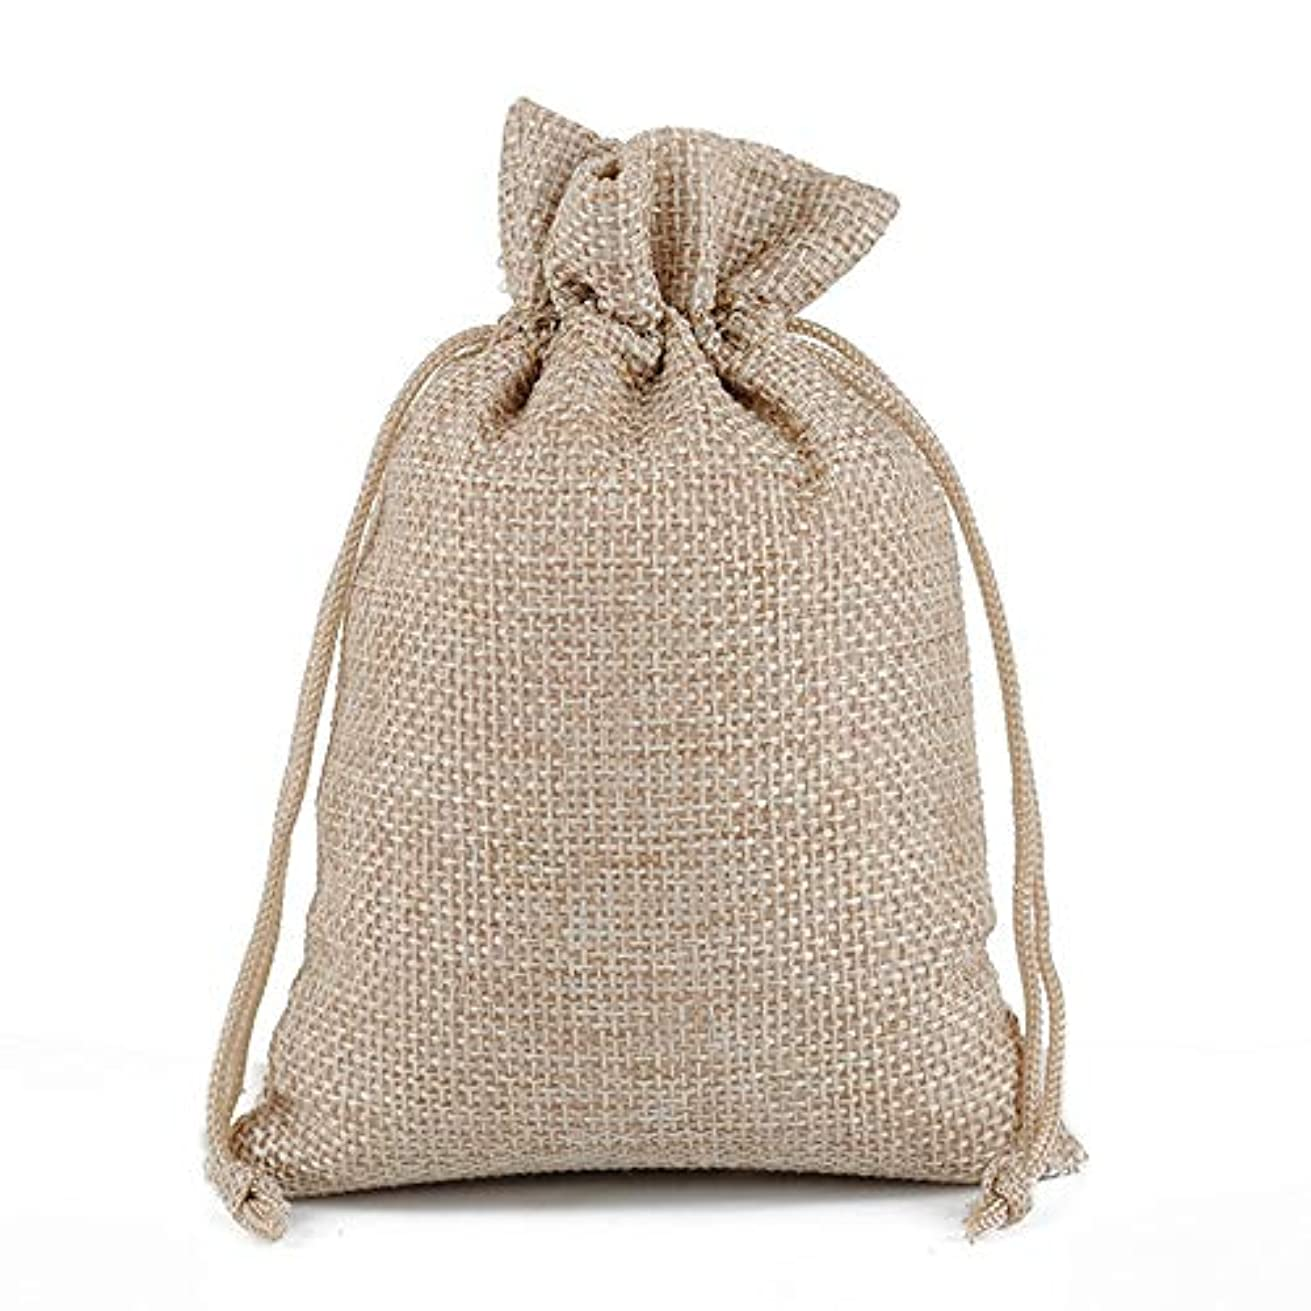 MELUOGE Burlap Bags Cotton Linen Bags Jewelry Treasure Pouches 6